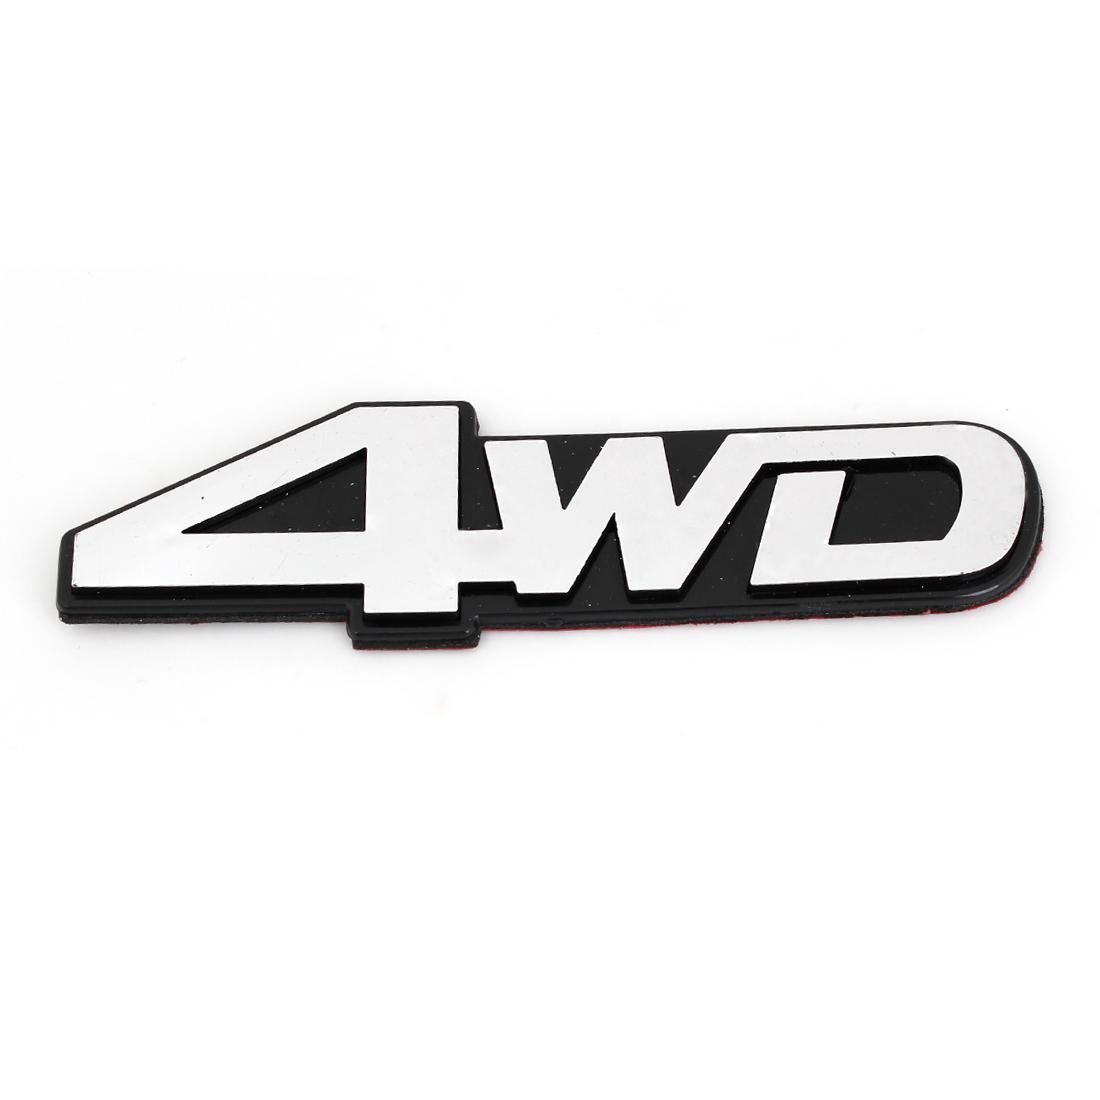 Silver Tone Plastic 4WD Shaped Adhesive Car Automobile Badge Sticker Decor